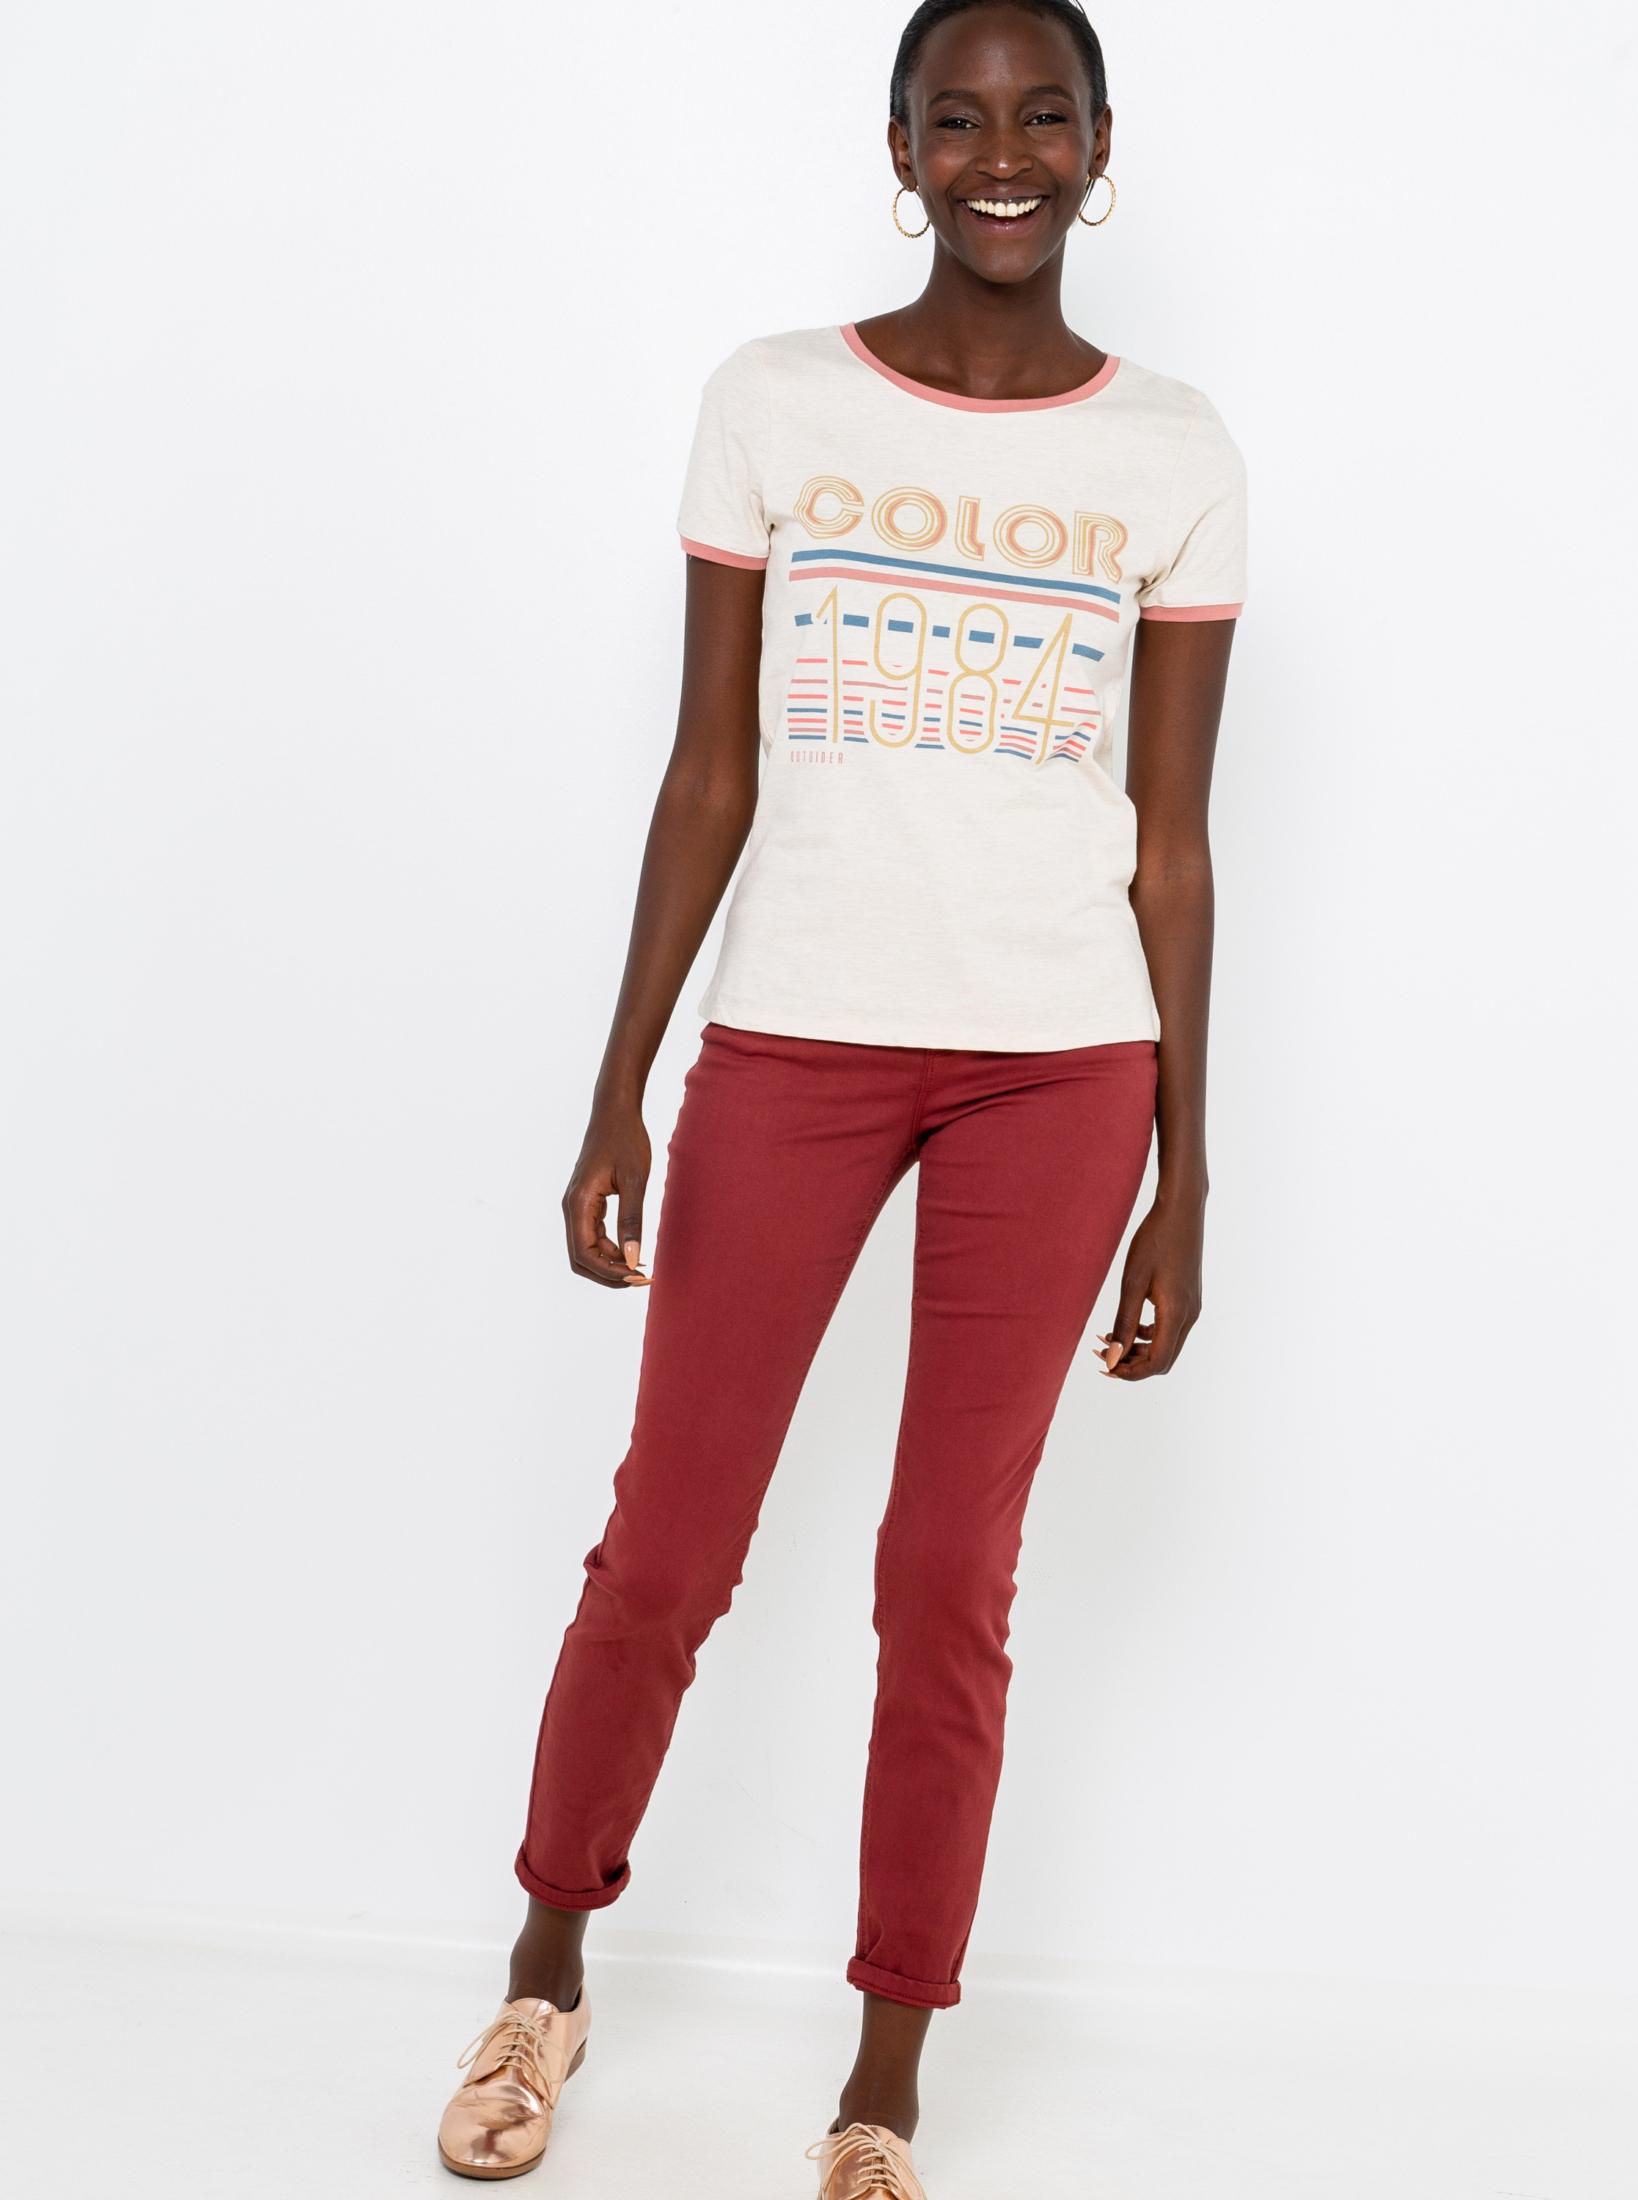 CAMAIEU smetanové/krémové tričko s nápisem